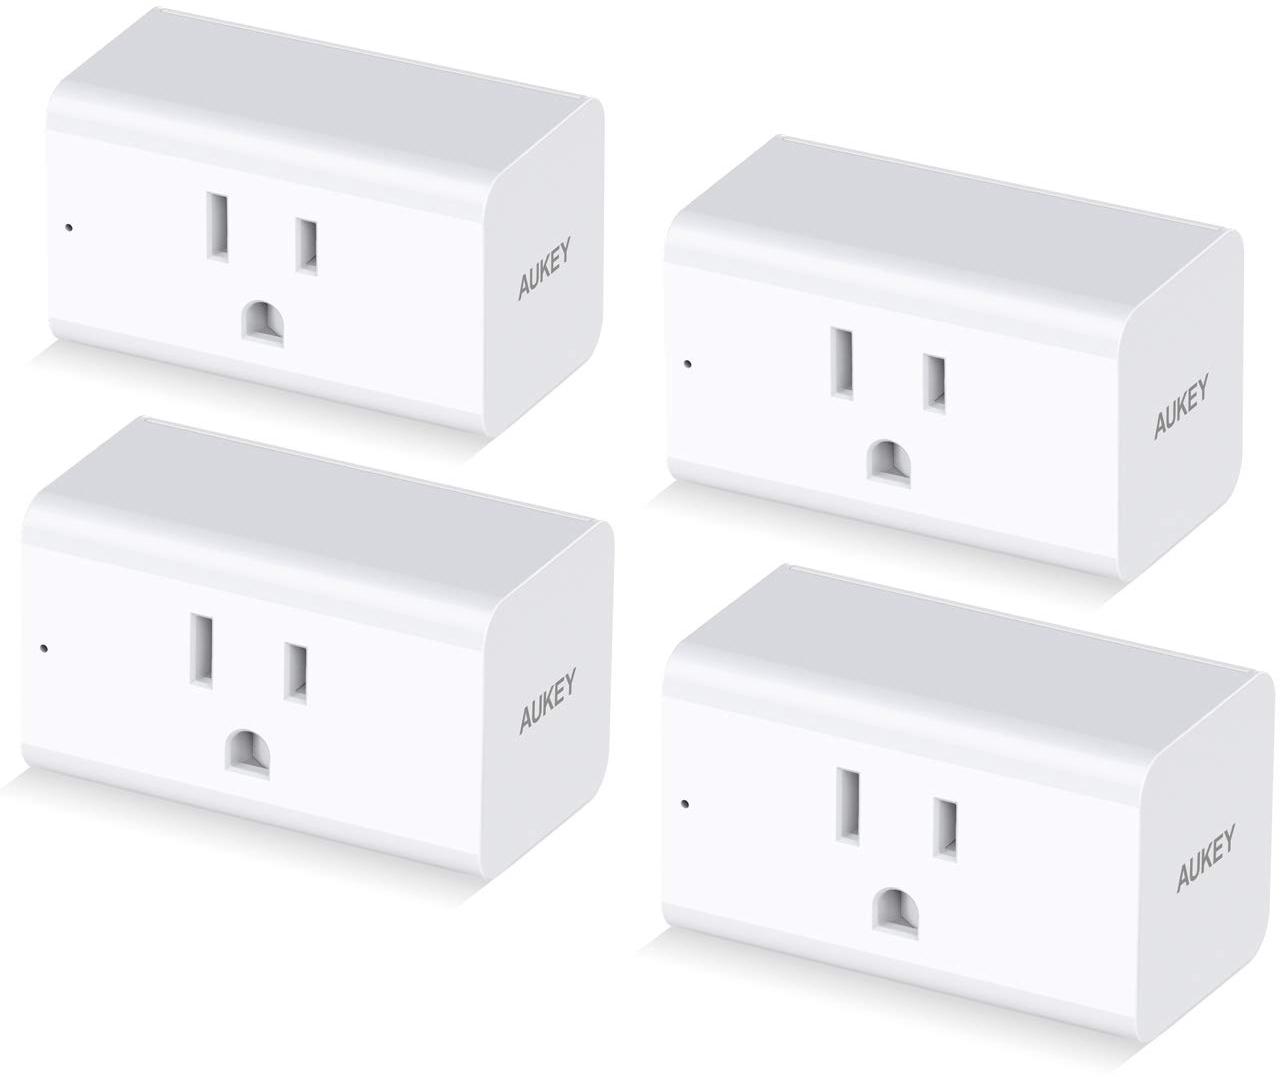 aukey-wi-fi-smart-plug-4-pack-press.jpg